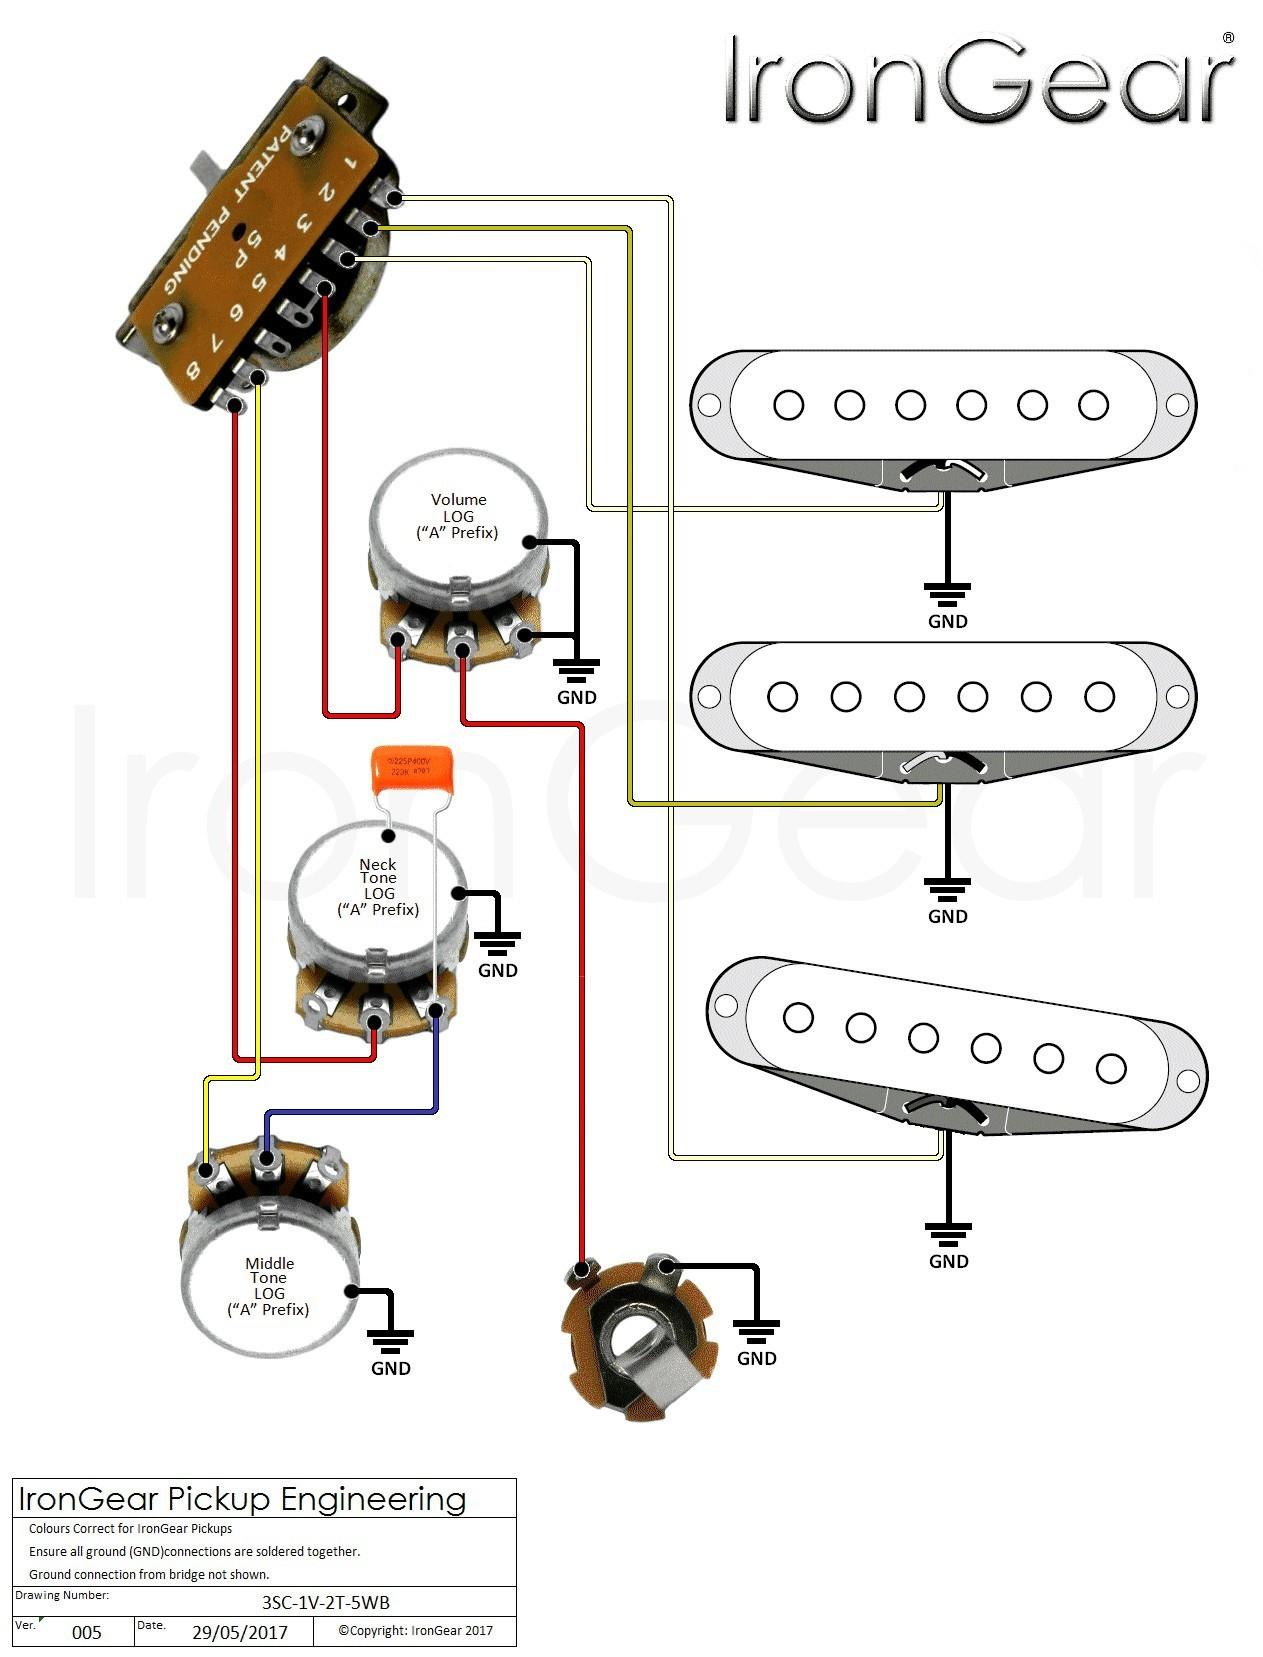 wiring diagram guitar 3 way switch valid stratocaster wiring diagram 3 way switch best squier strat for of wiring diagram guitar 3 way switch